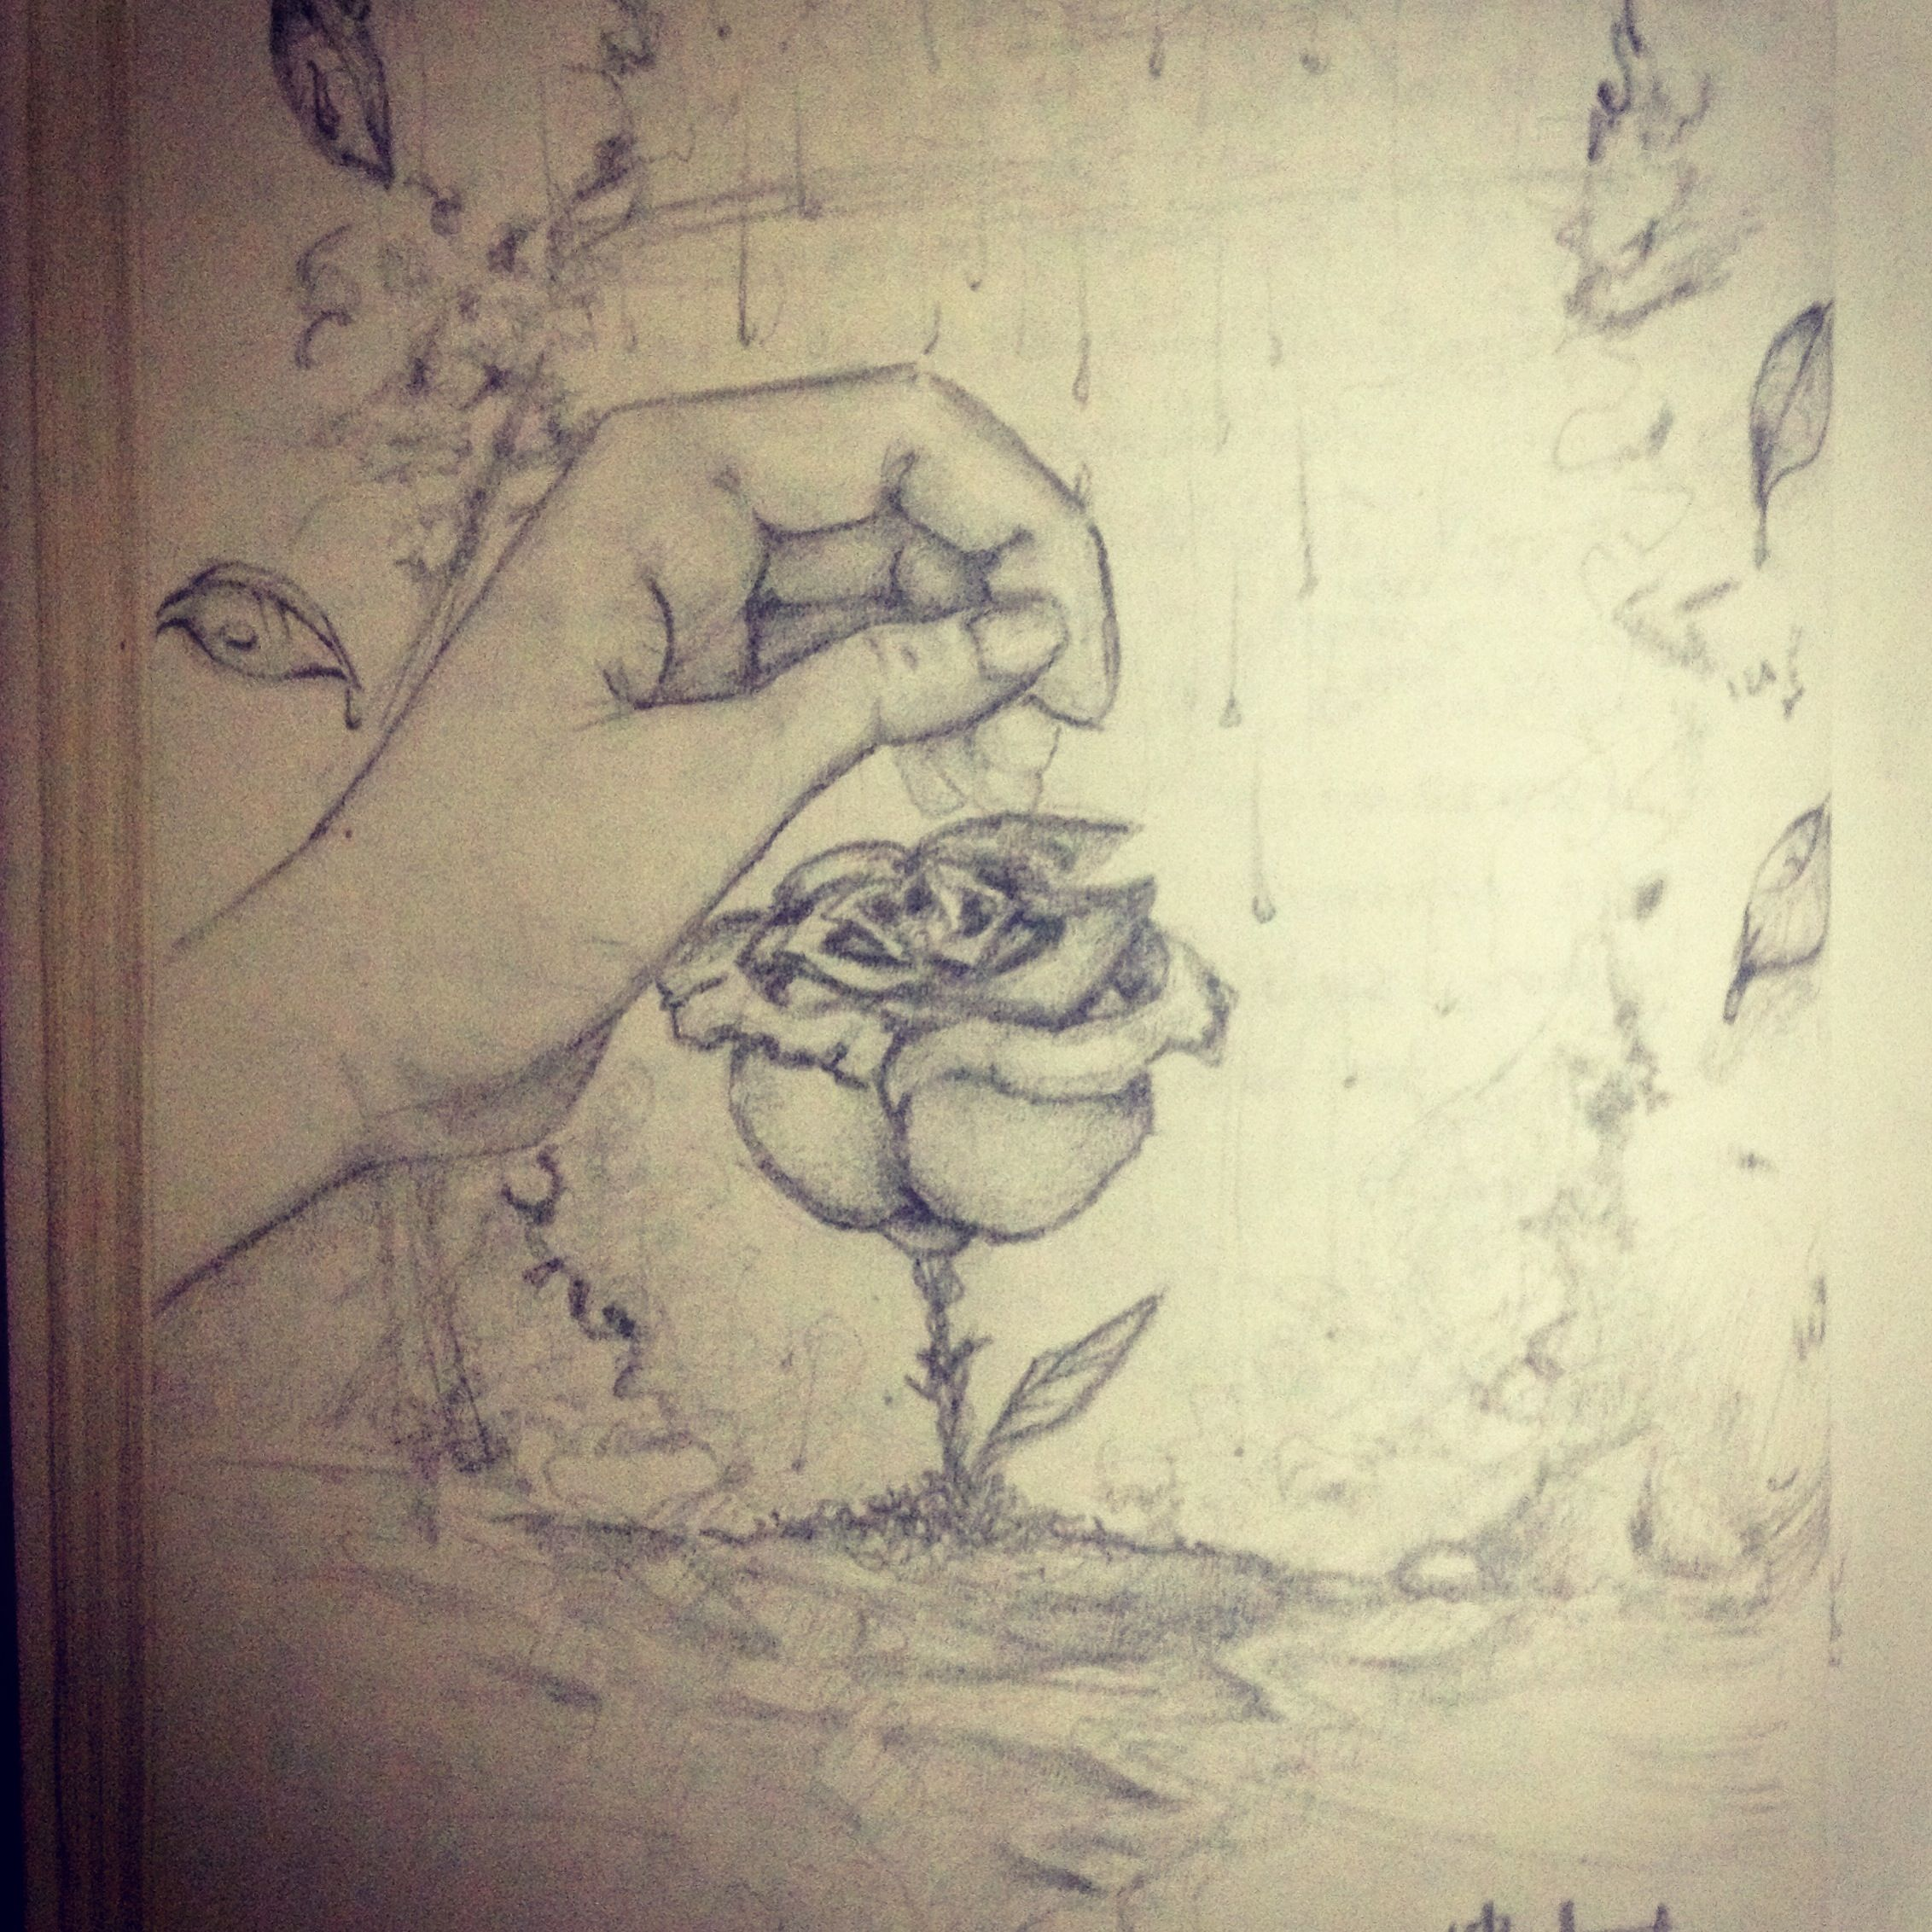 Flor Bajo La Lluvia Art Draw Drawing Mano Hand Dibujo Lapiz Artist Visual Beautifull Poem Suave Lluvia Rain Flower Dibujos Dibujos A Lapiz Lluvia